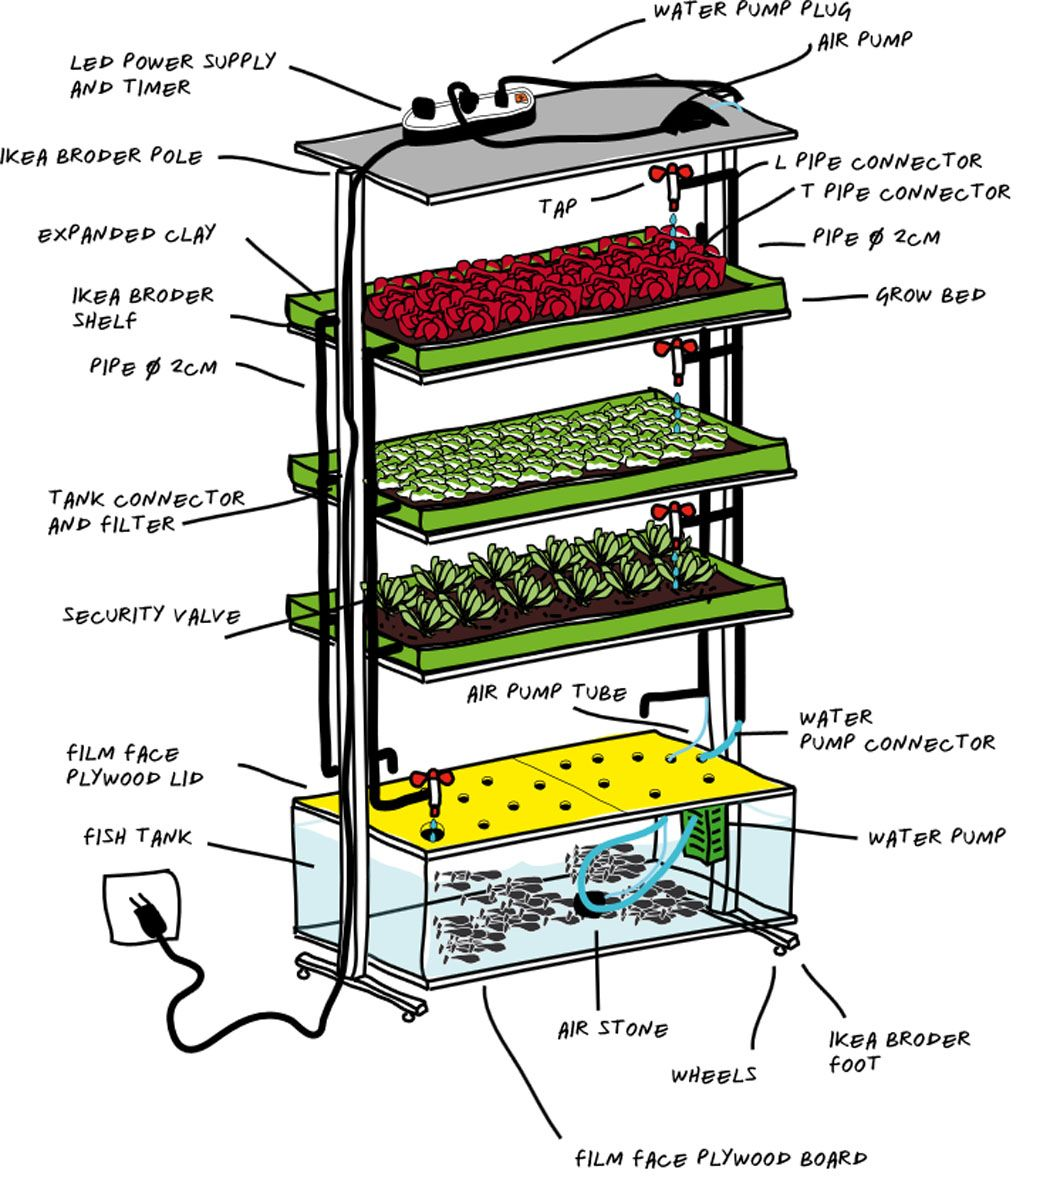 diy ikea shelf inhome aquaponics planted space